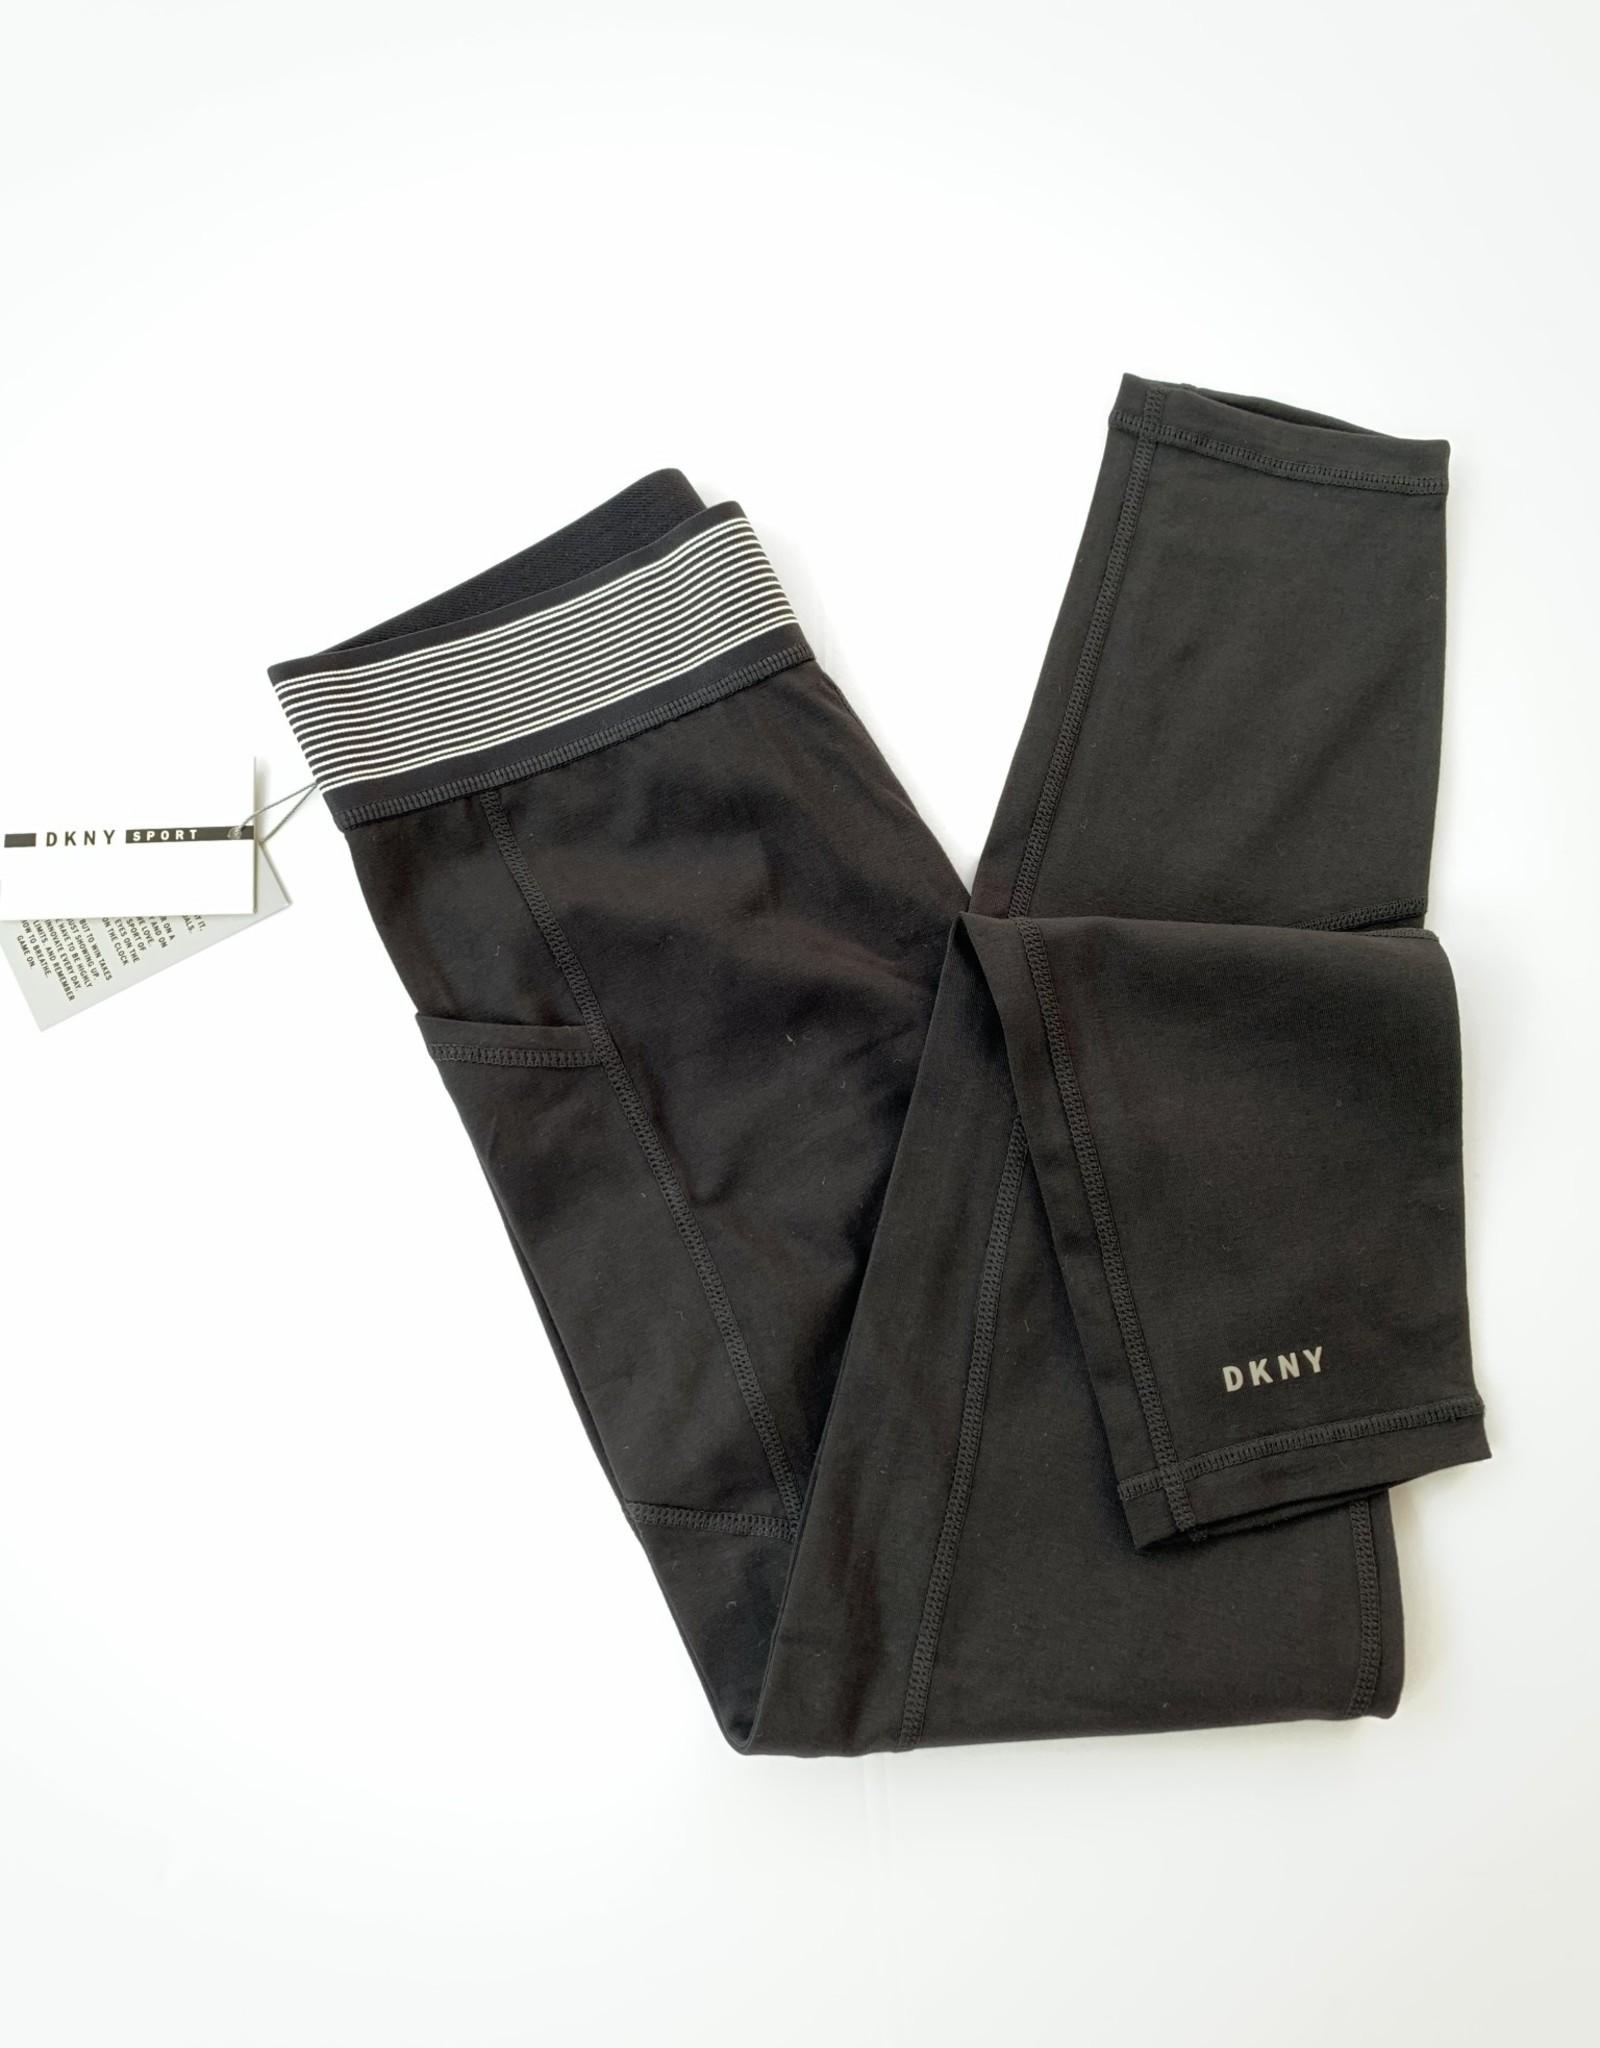 DKNY DKNY Leggings High Waist 7/8 w/ Side Pockets